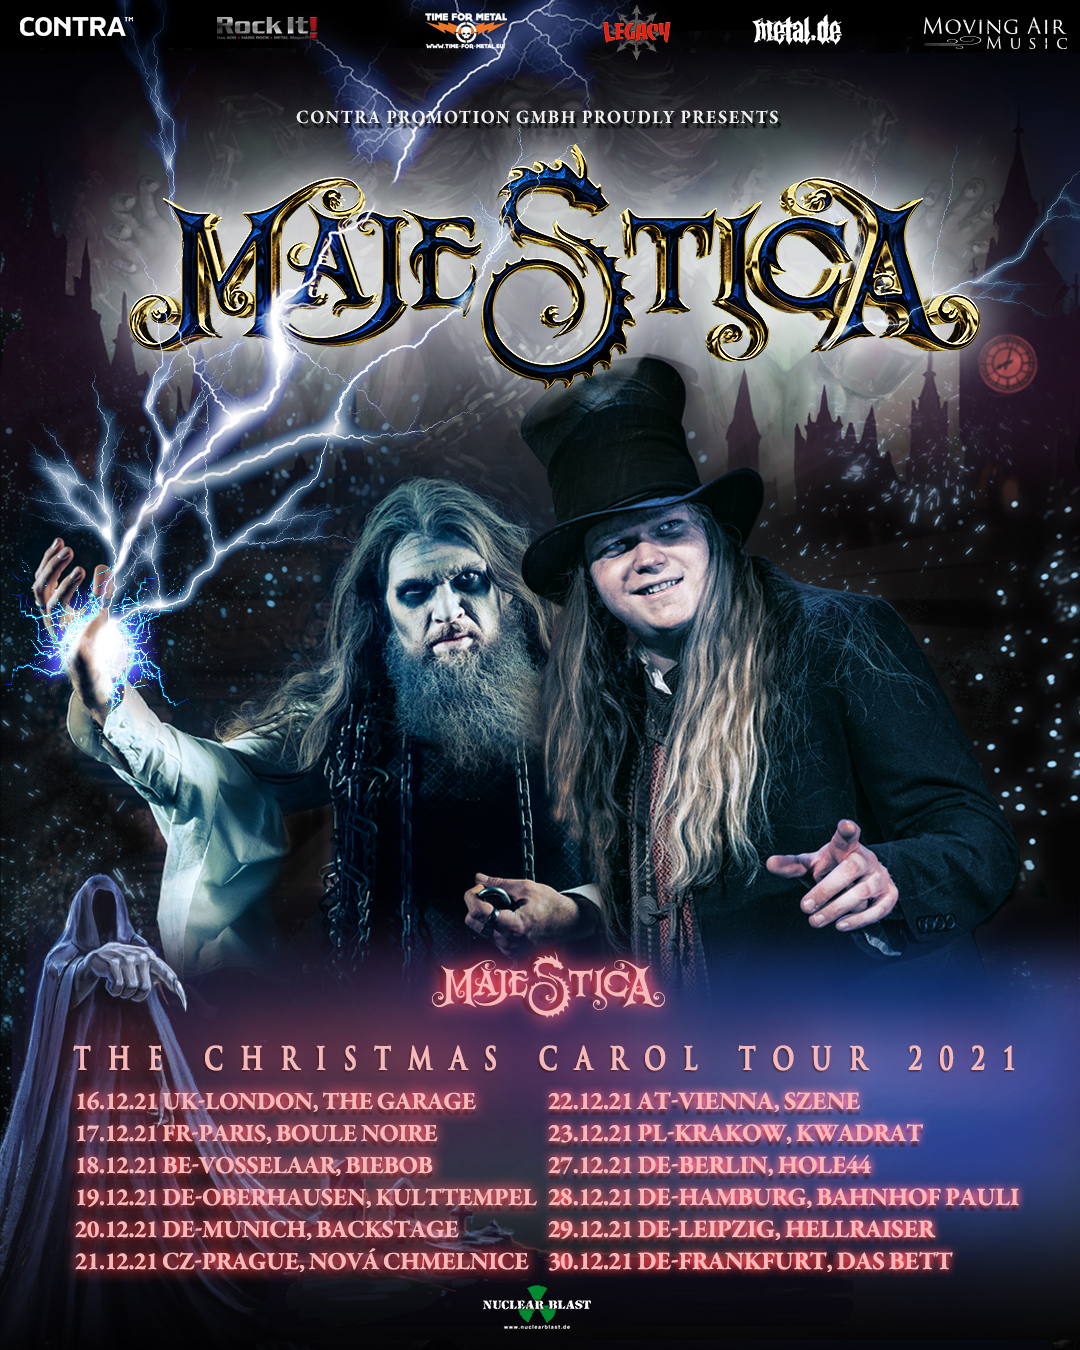 Majestica The Christmas Carol Tour 2021 Flyer